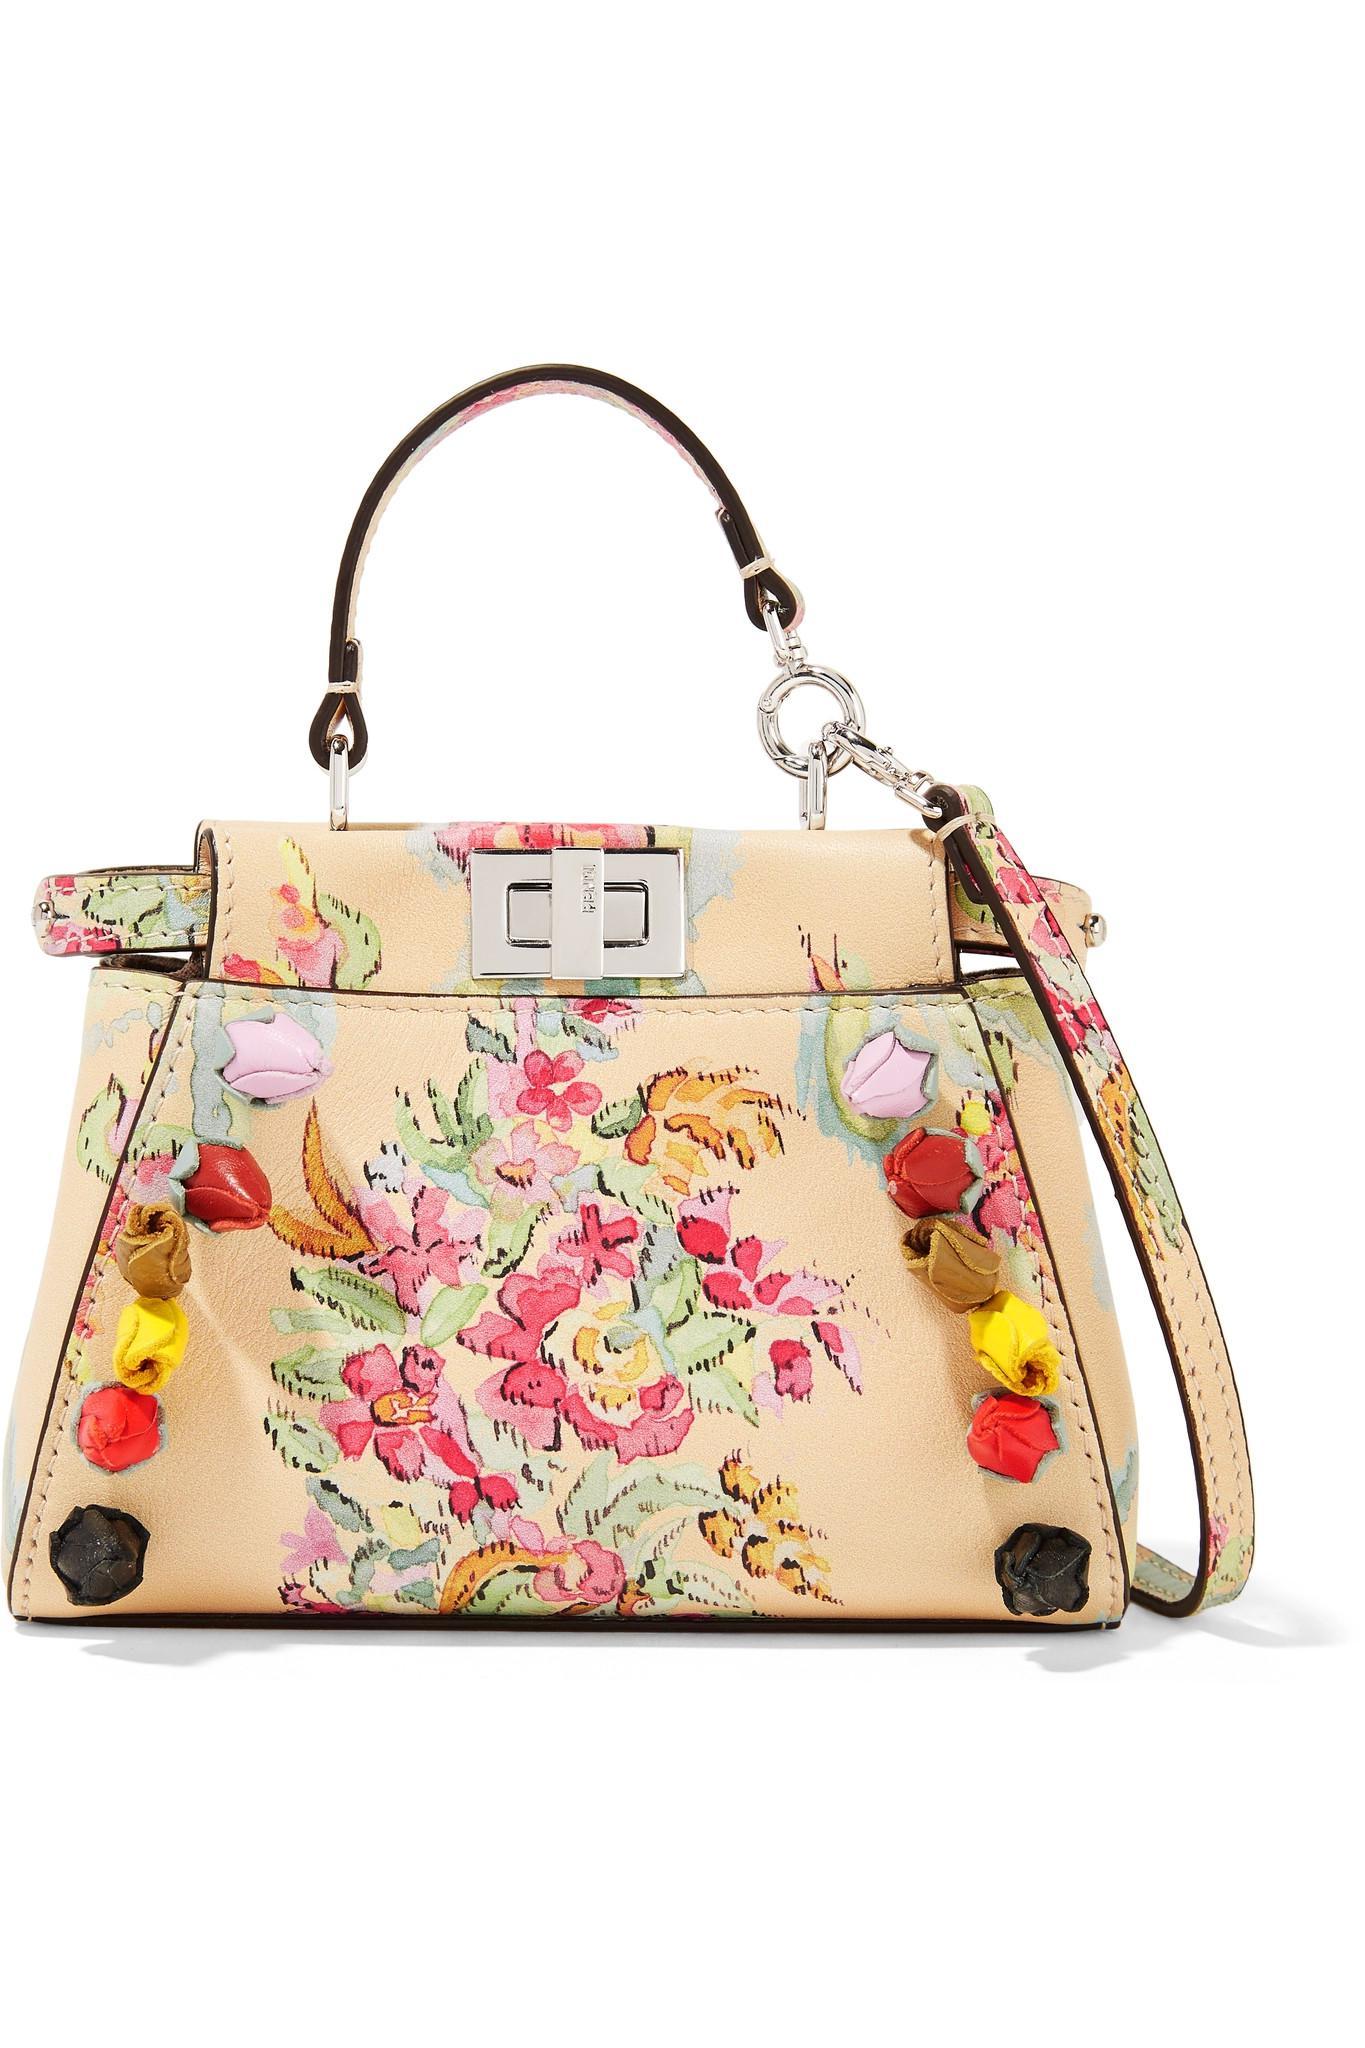 b8e5a184c1 Lyst - Fendi Peekaboo Micro Appliquéd Printed Leather Shoulder Bag ...